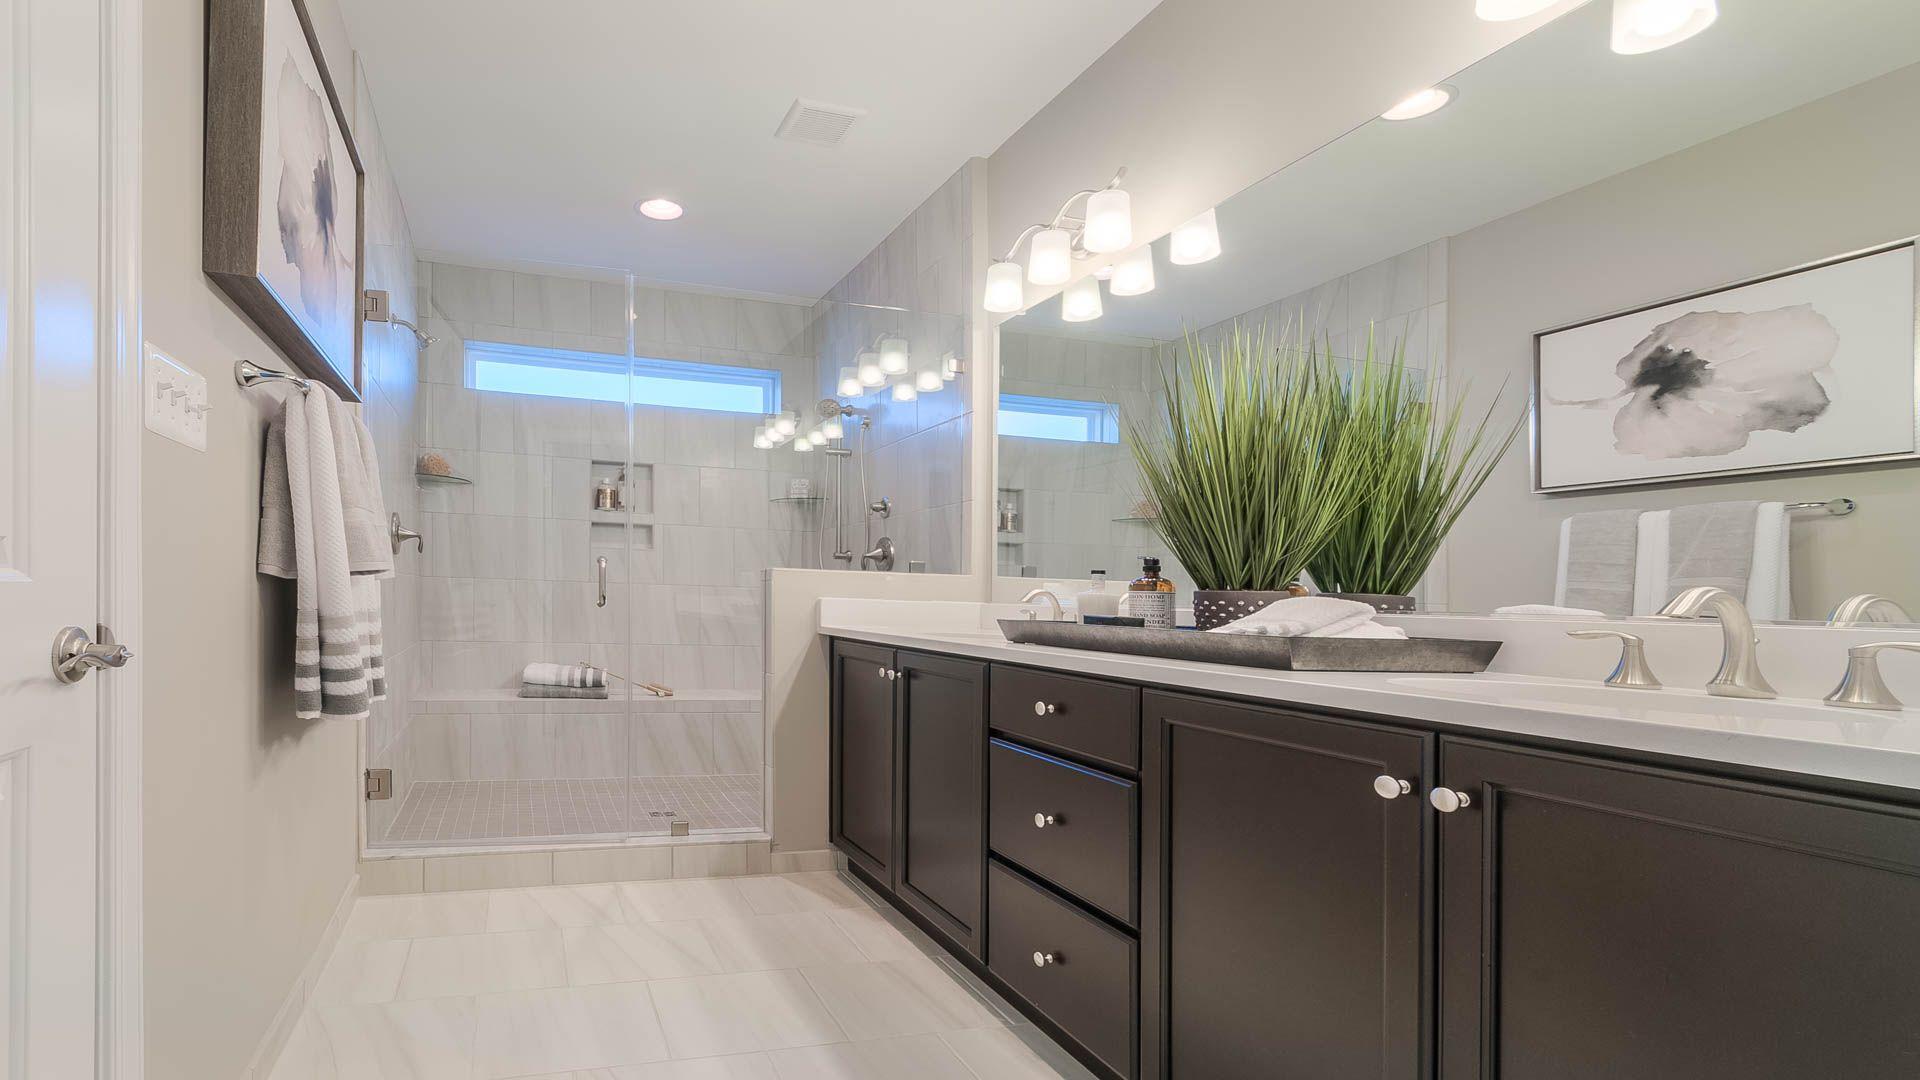 Bathroom featured in The Vanderbilt By Wormald Homes in Washington, MD